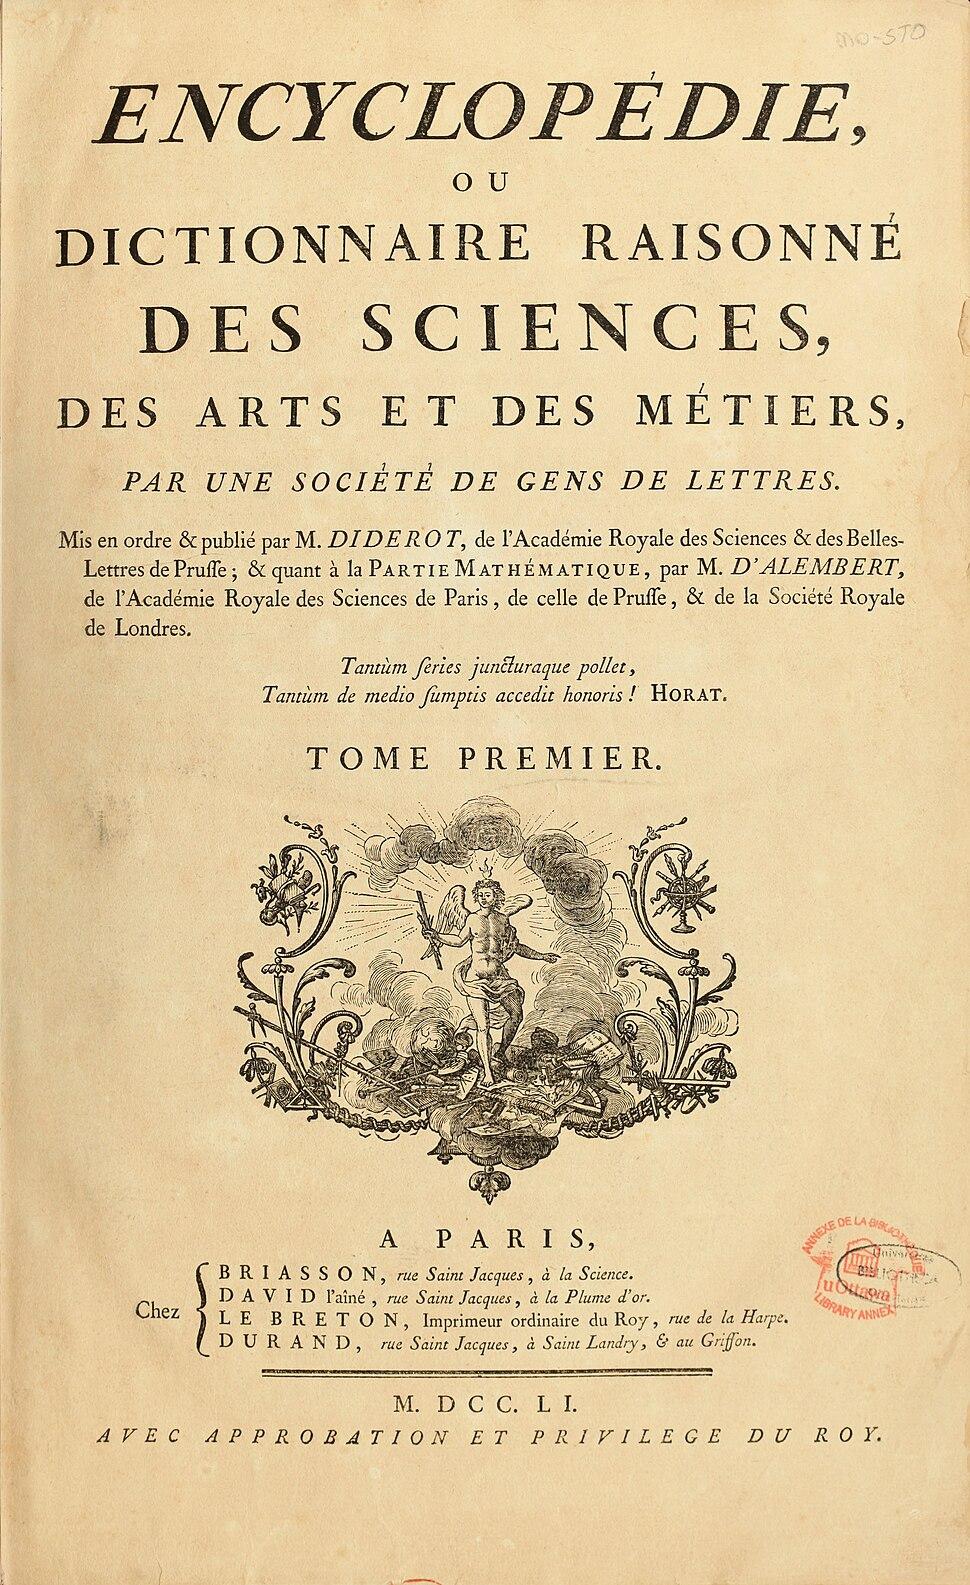 Encyclopedie de D'Alembert et Diderot - Premiere Page - ENC 1-NA5